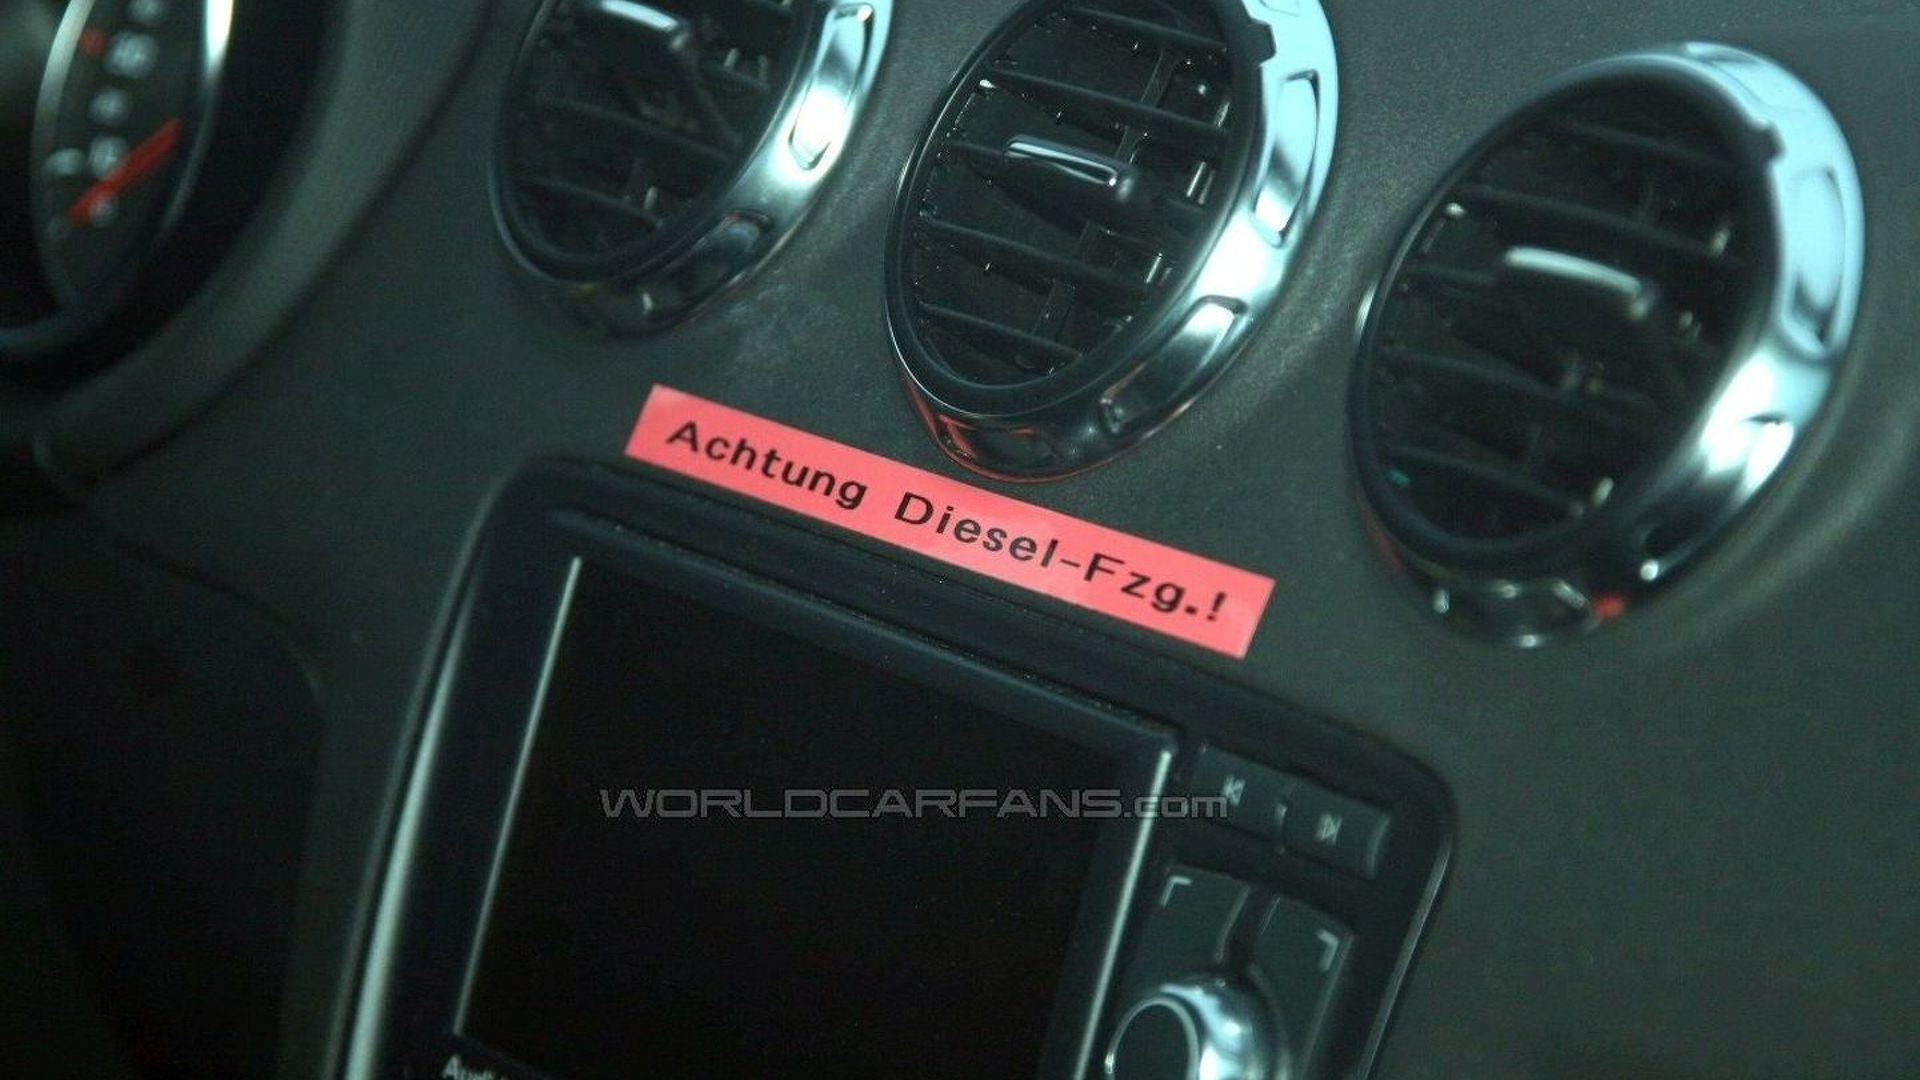 New Evidence Confirms Audi TT Diesel